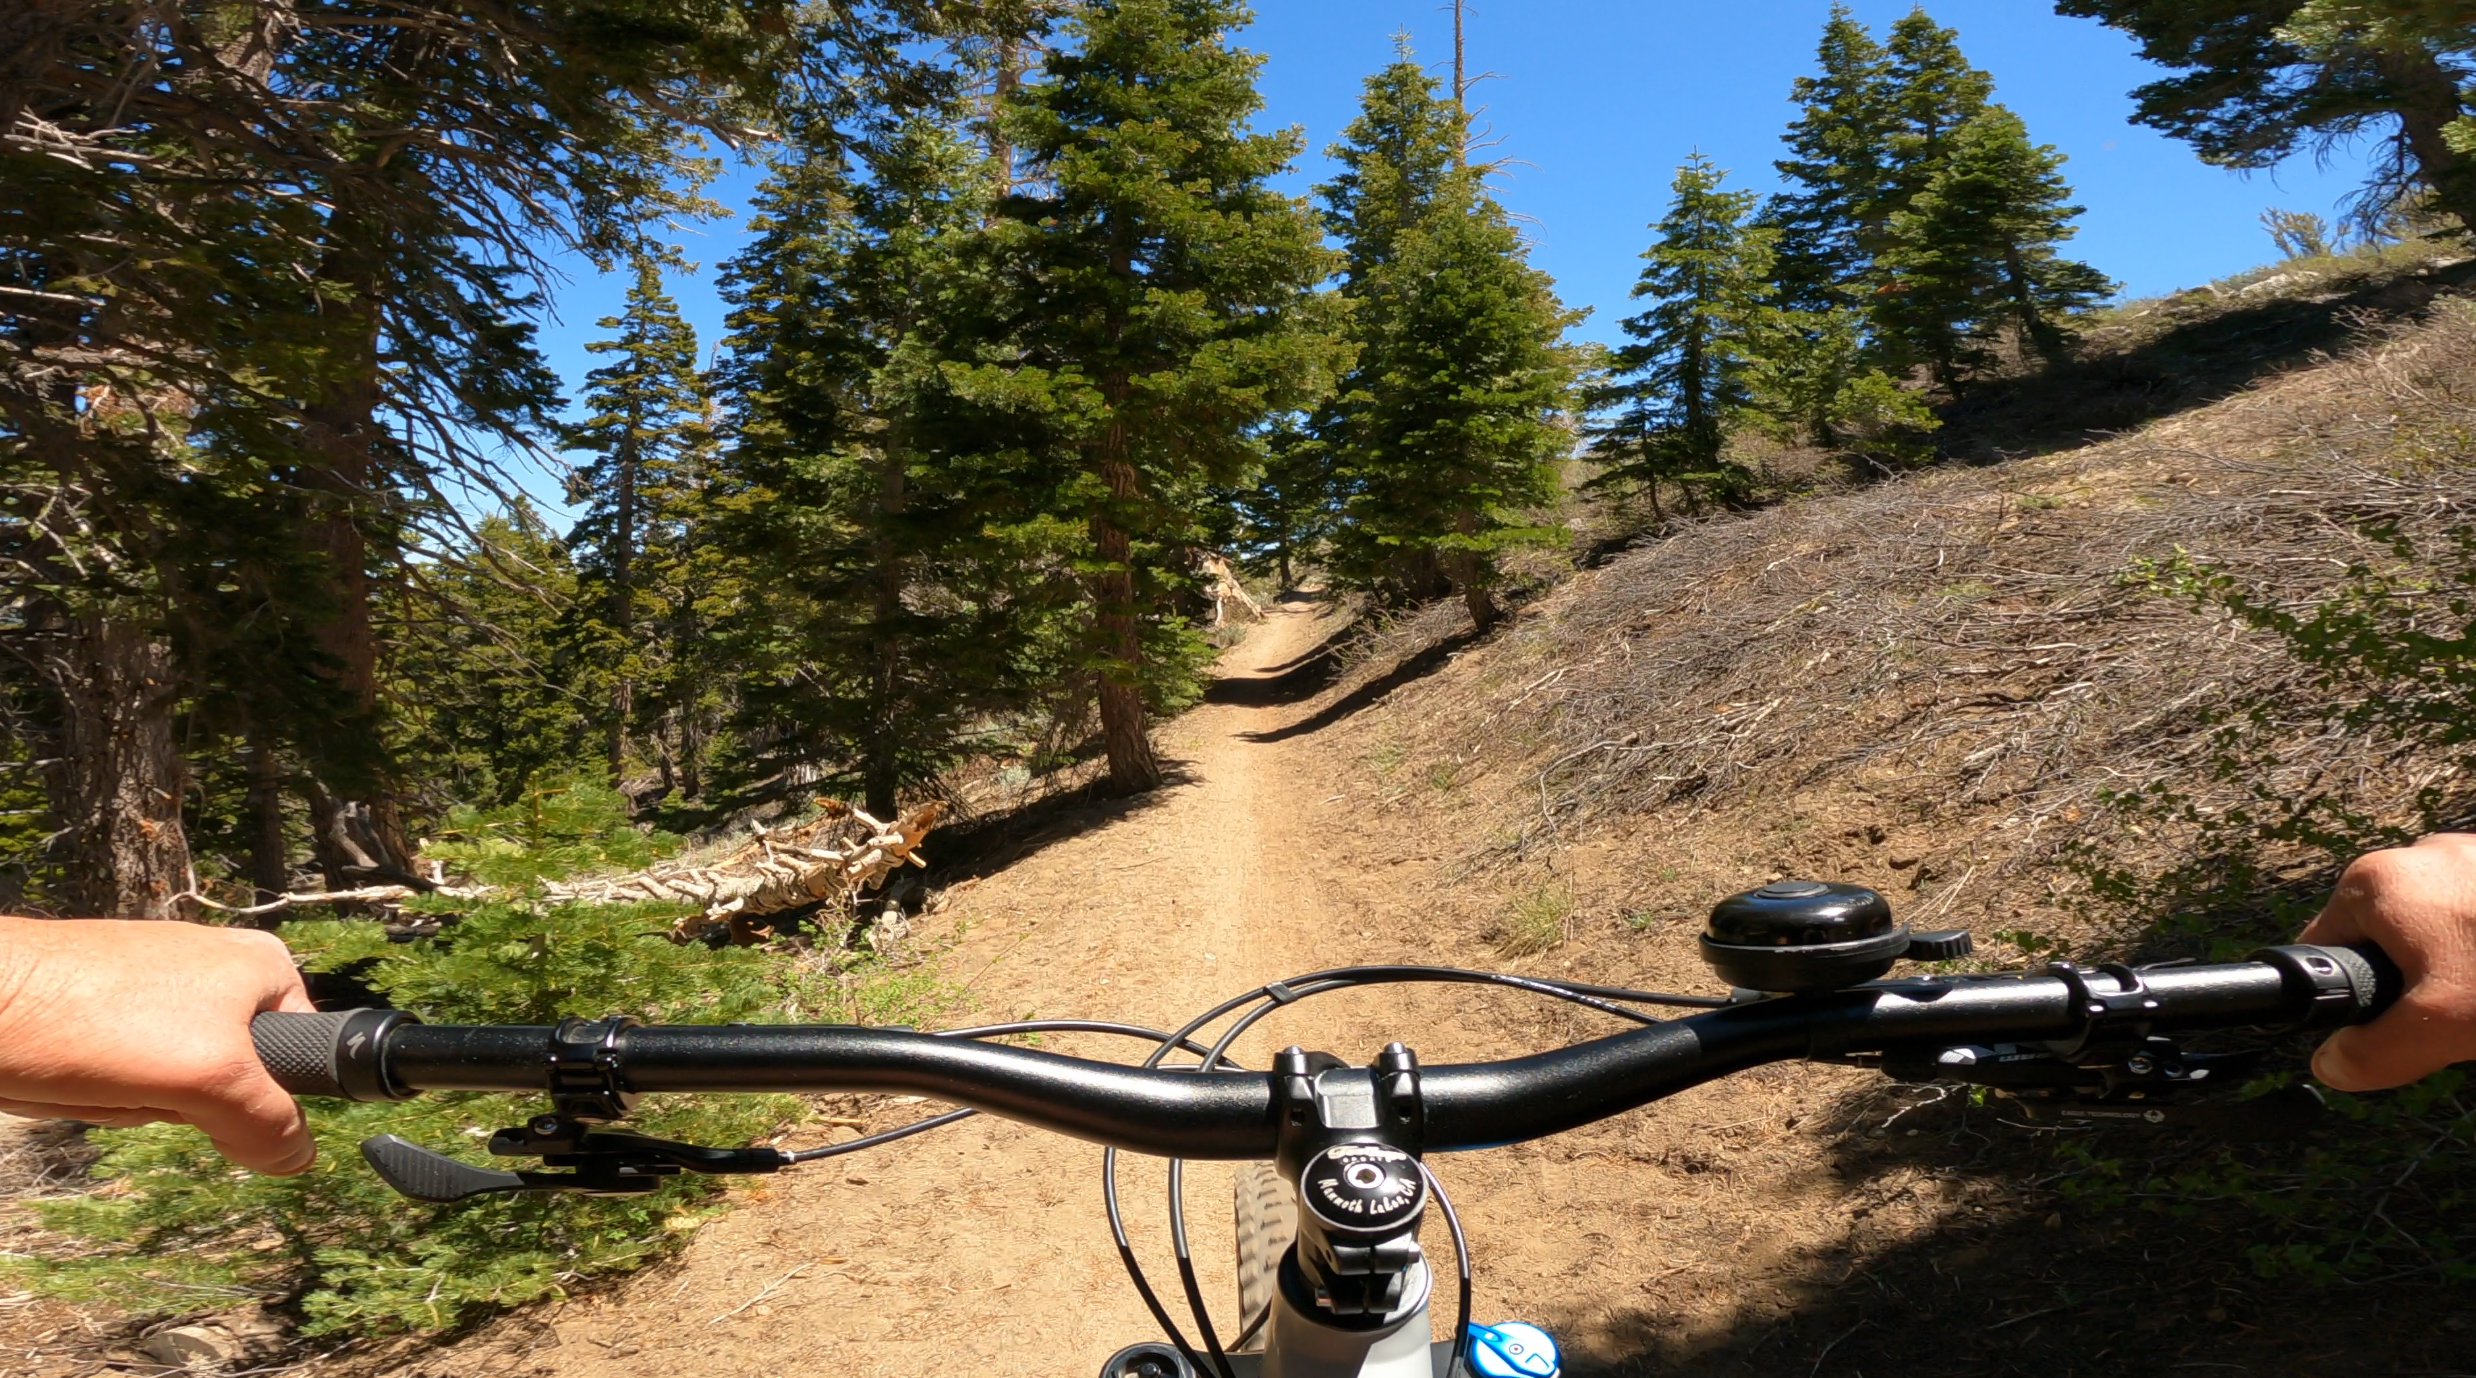 Mountain Biking on the Mammoth Rock Trail